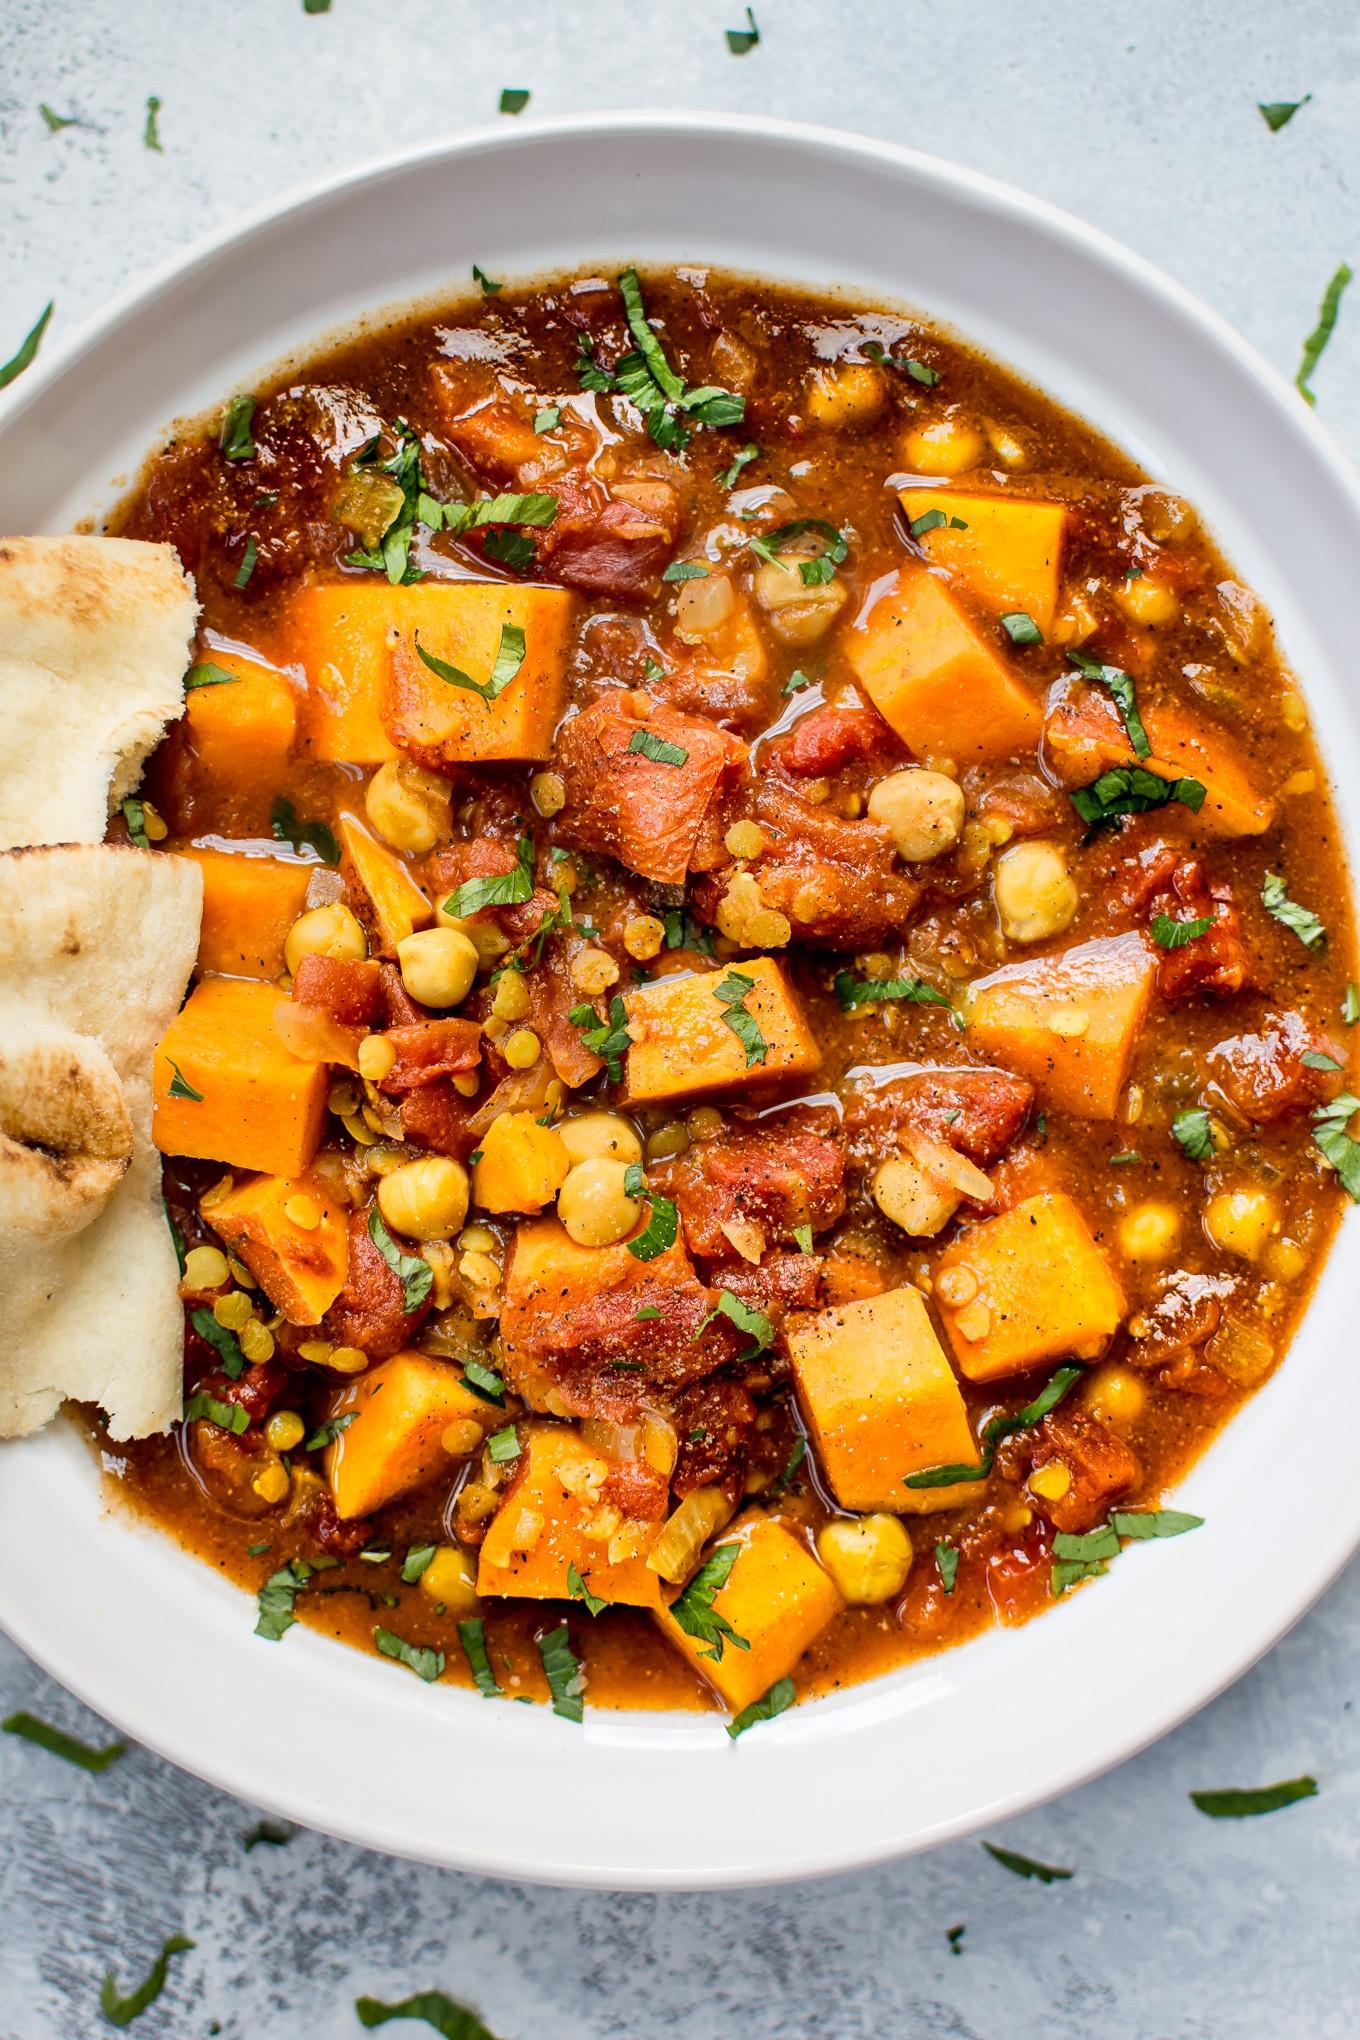 Vegan Crock Pot Recipes  Vegan Sweet Potato Curry Crockpot Recipe • Salt & Lavender